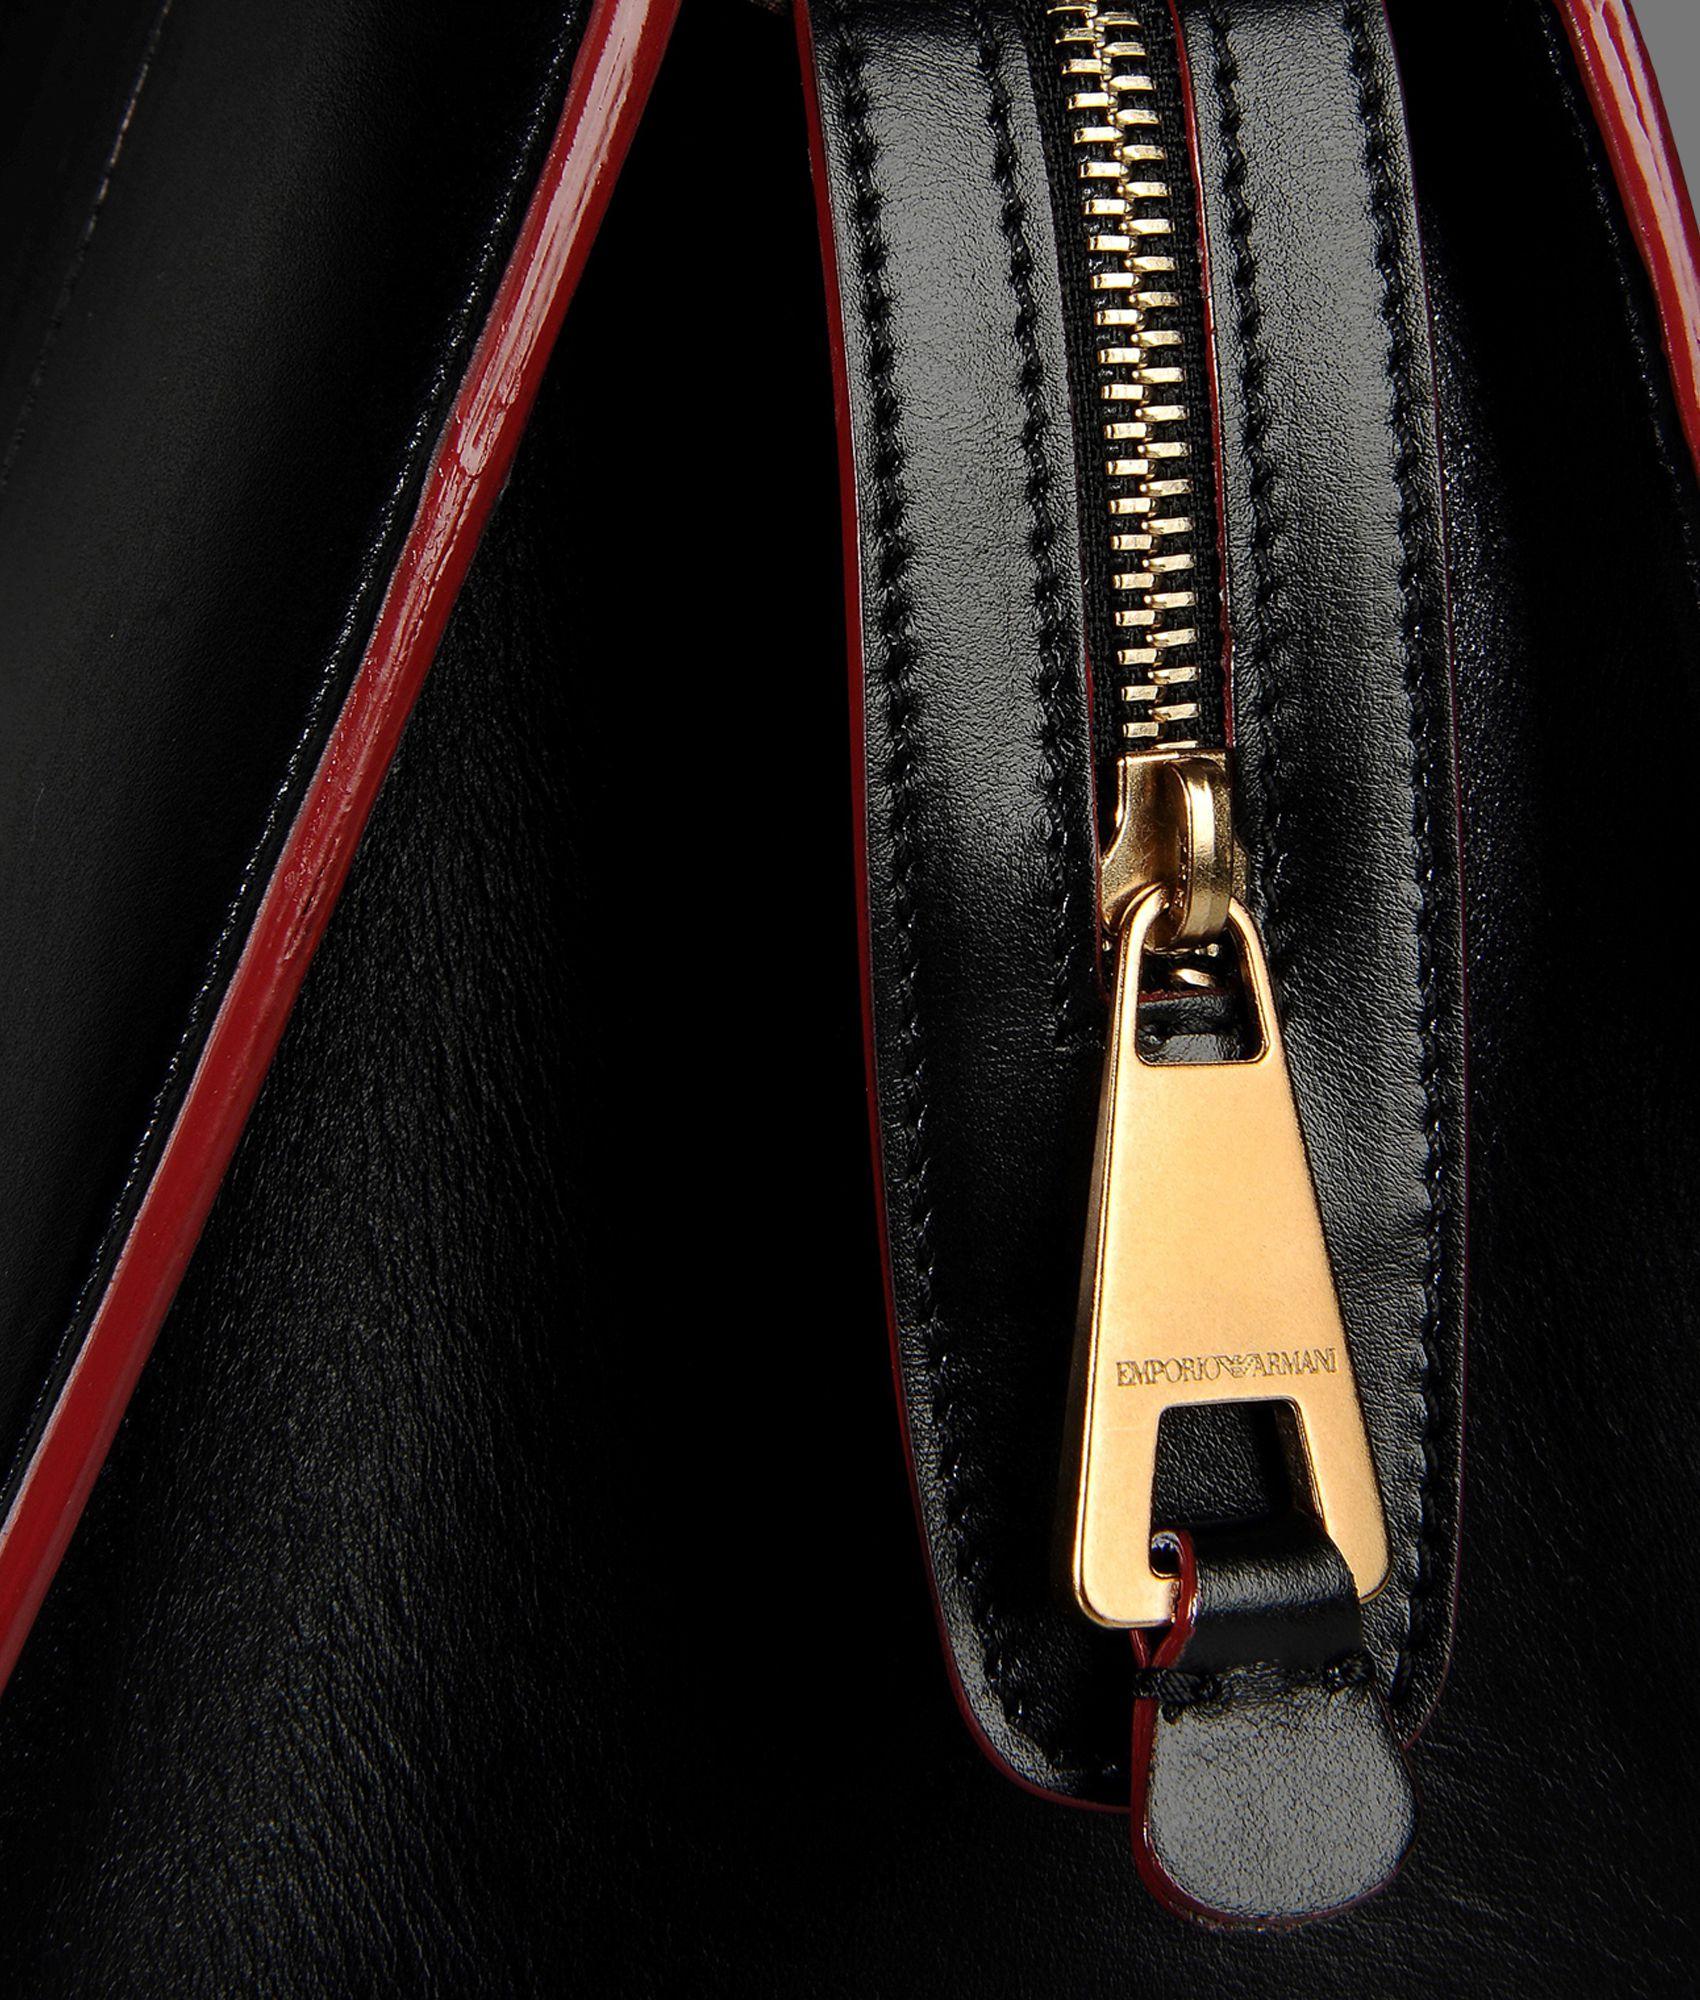 Sac A Main Armani Sport : Emporio armani sac ? main in black lyst